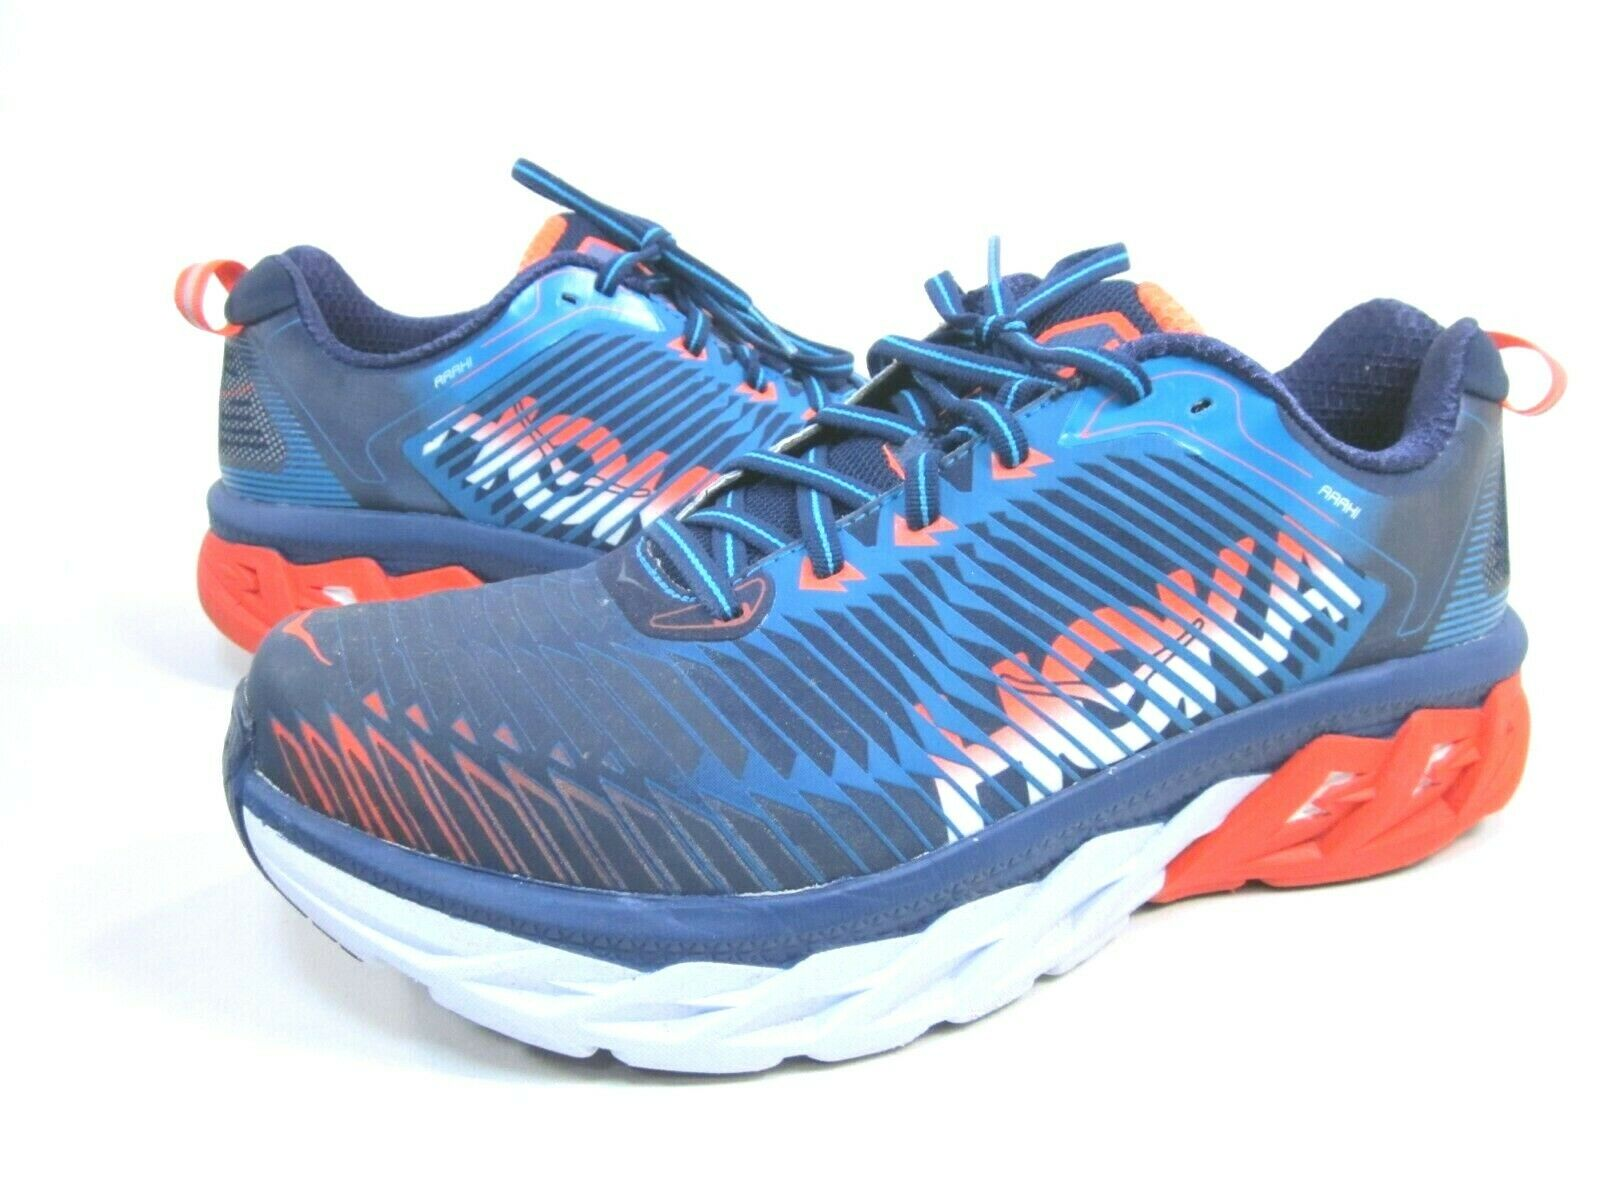 HOKA ONE Hombre Zapatos Deportivos ARAHI ONE, Medieval Azul Rojo Naranja, US tamaño 12 M